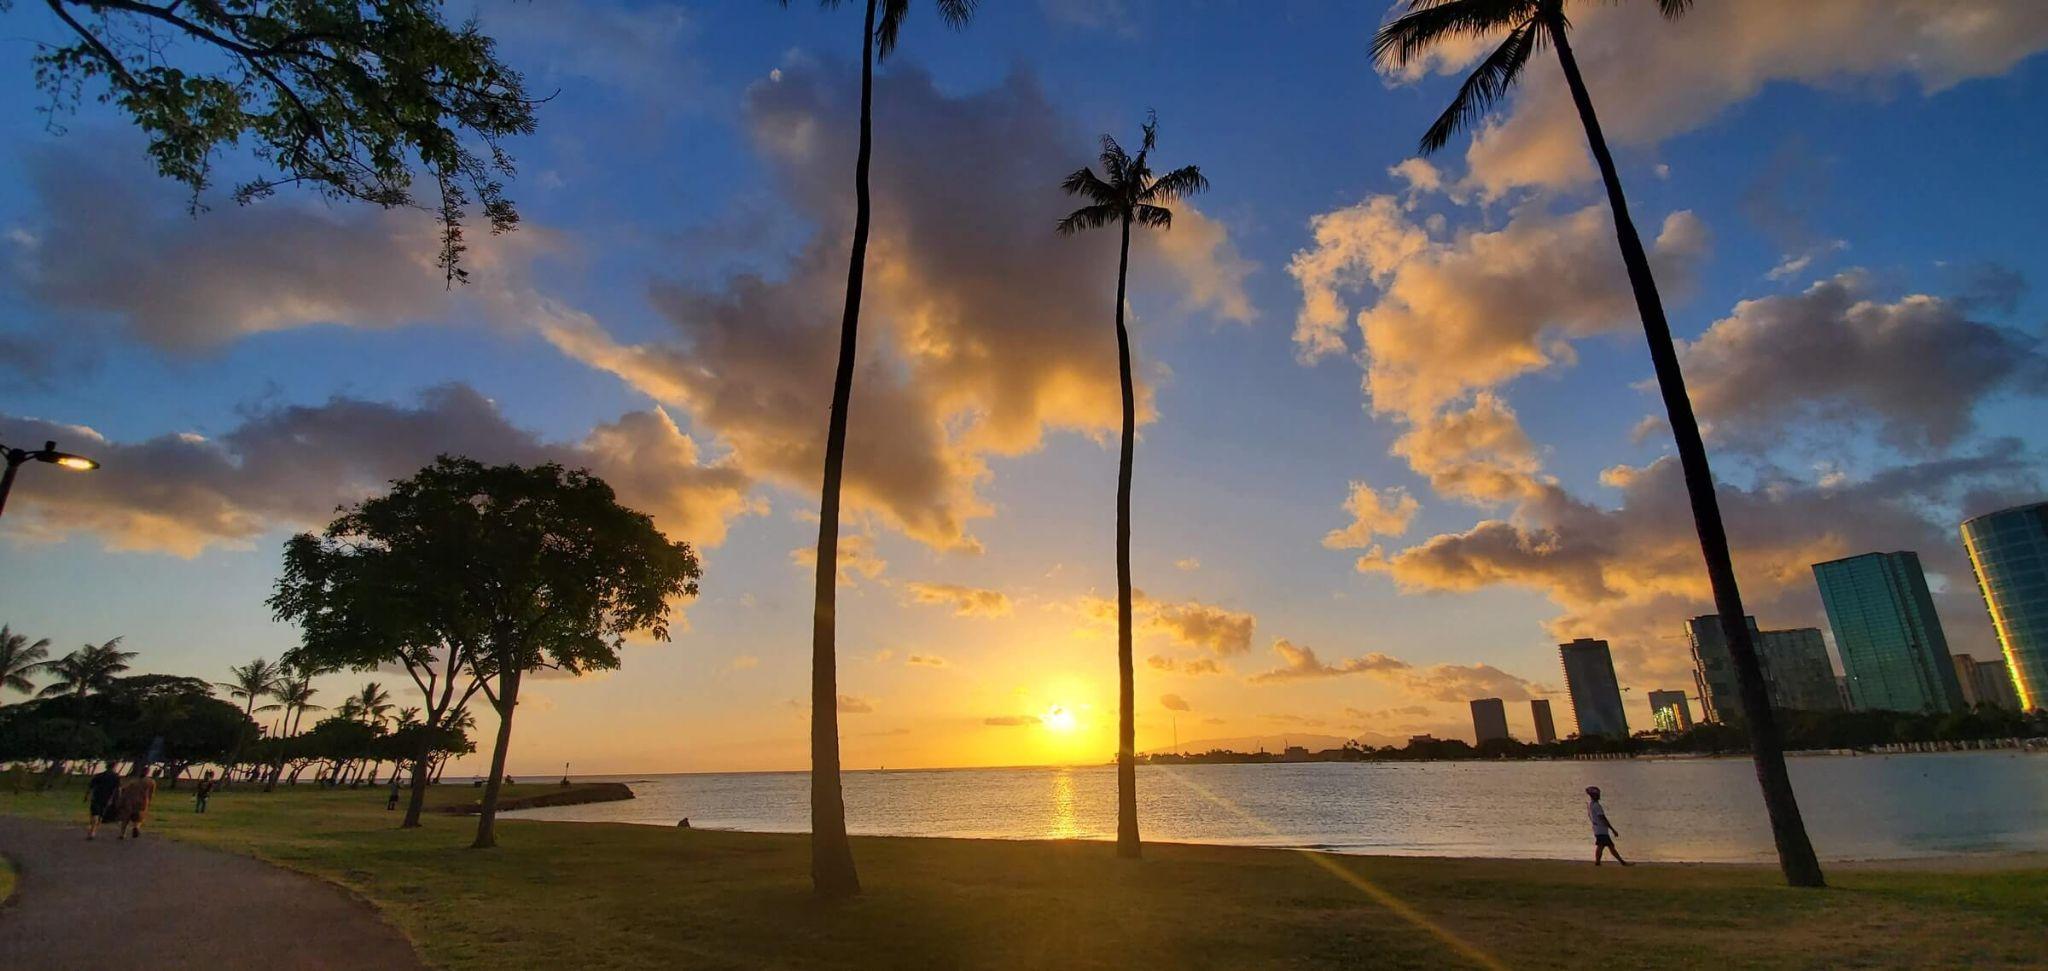 5 days in Oahu itinerary, Waikiki Beach Park sunset